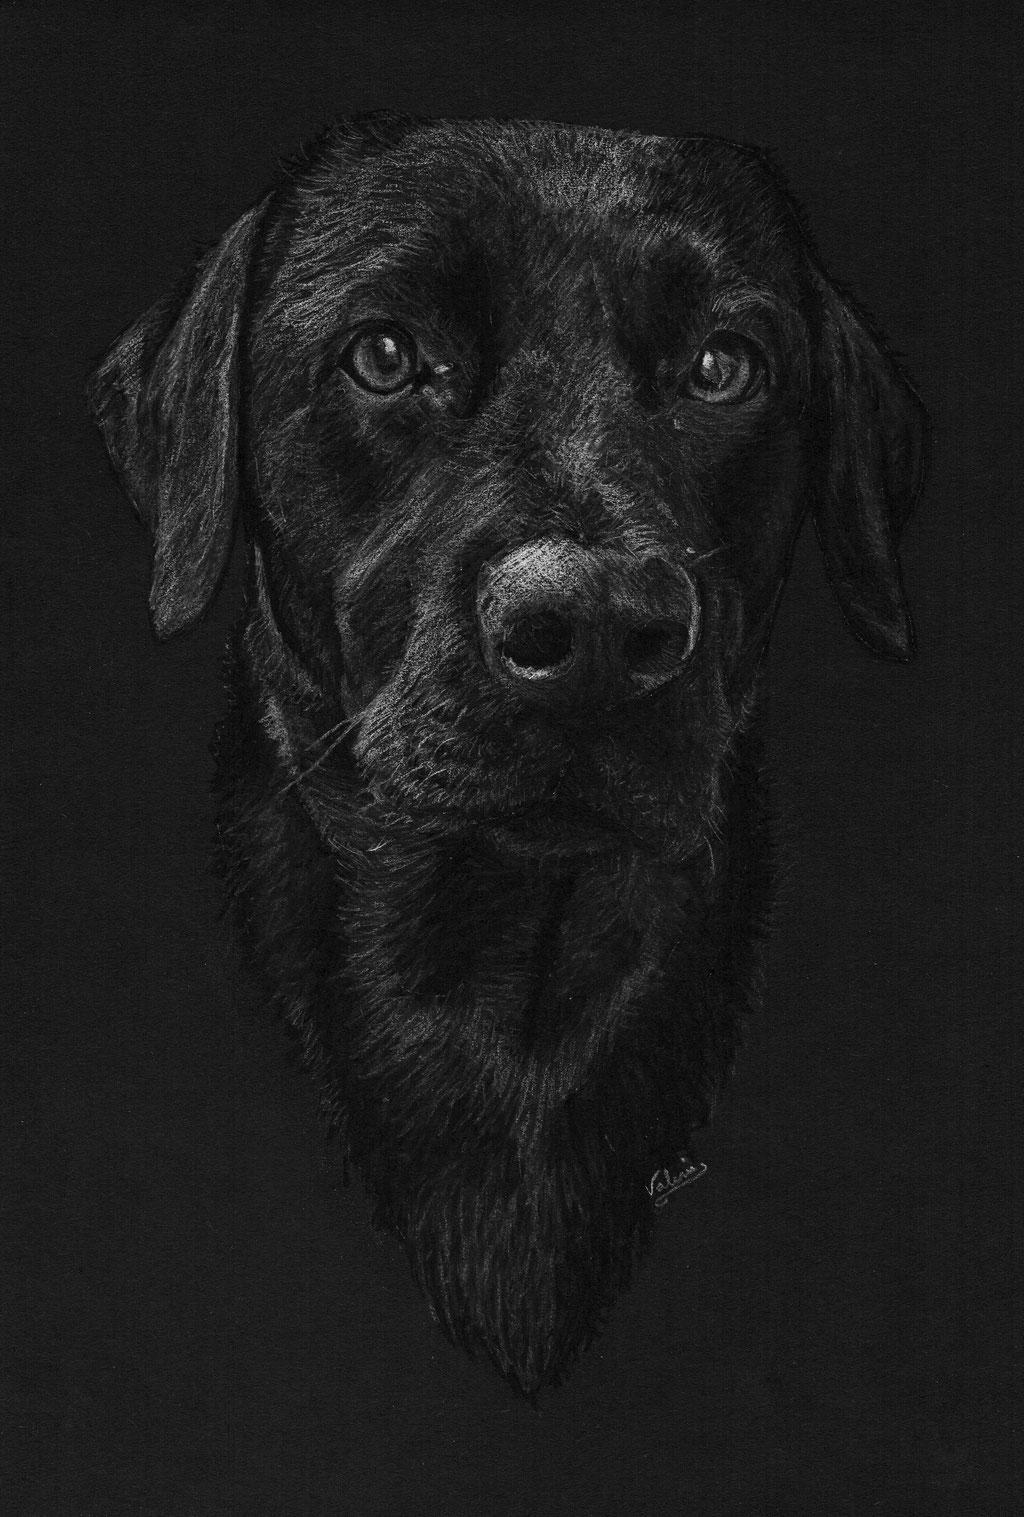 Dierenportret labrador retriever: Wit potlood op zwart papier (2017)